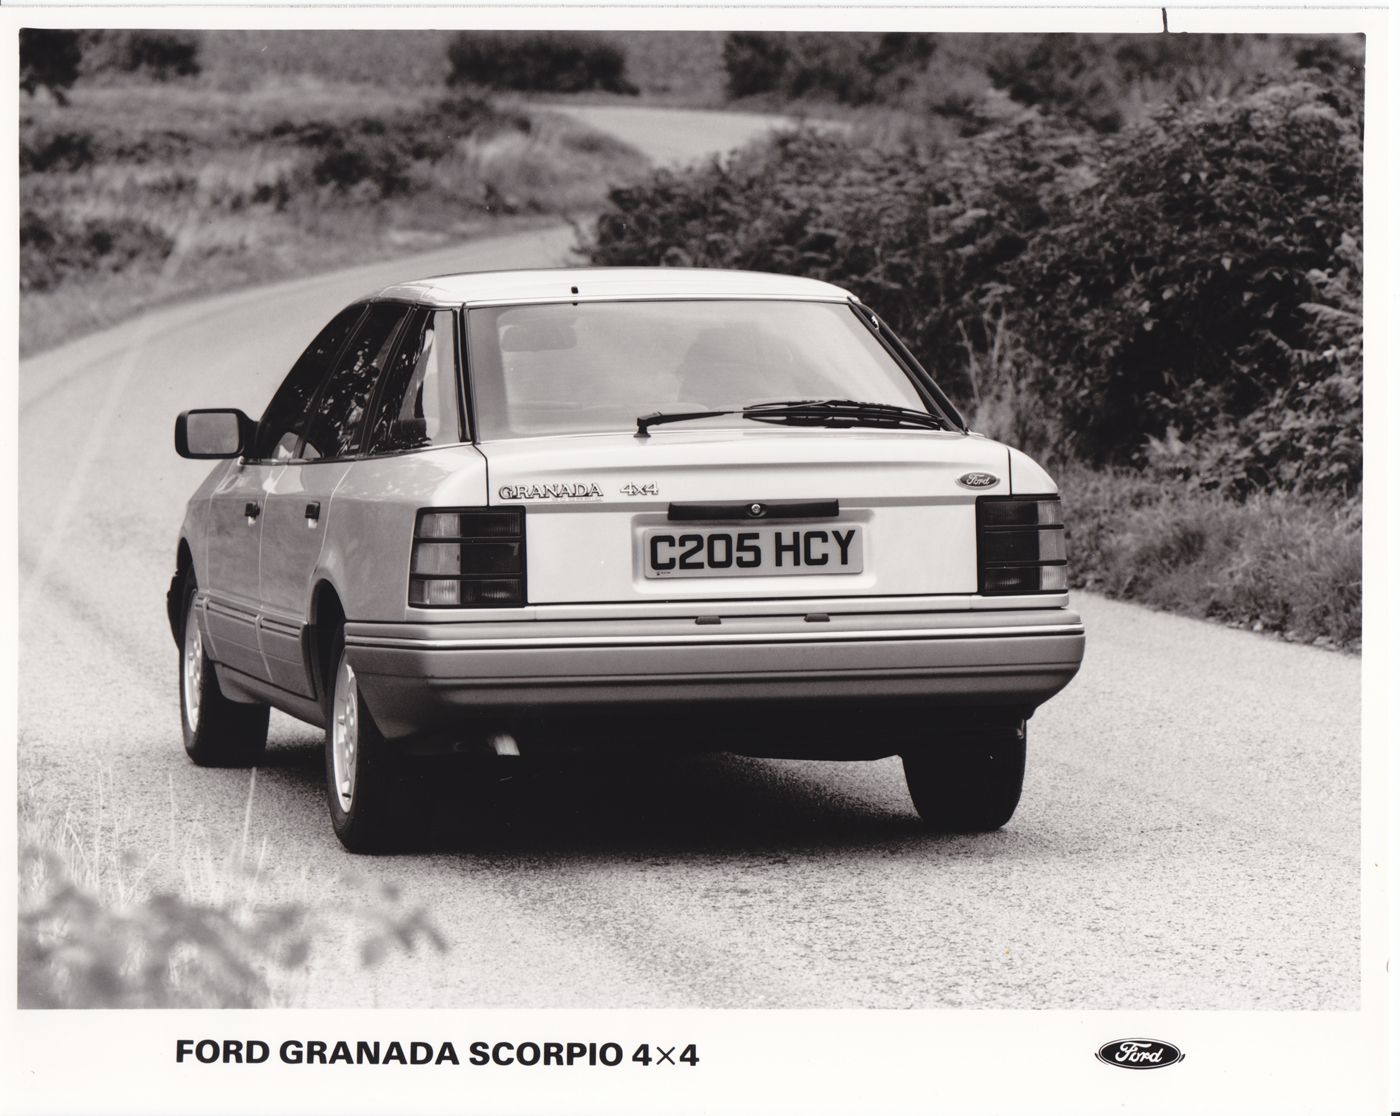 Old classic ford scorpio 4x4 1985